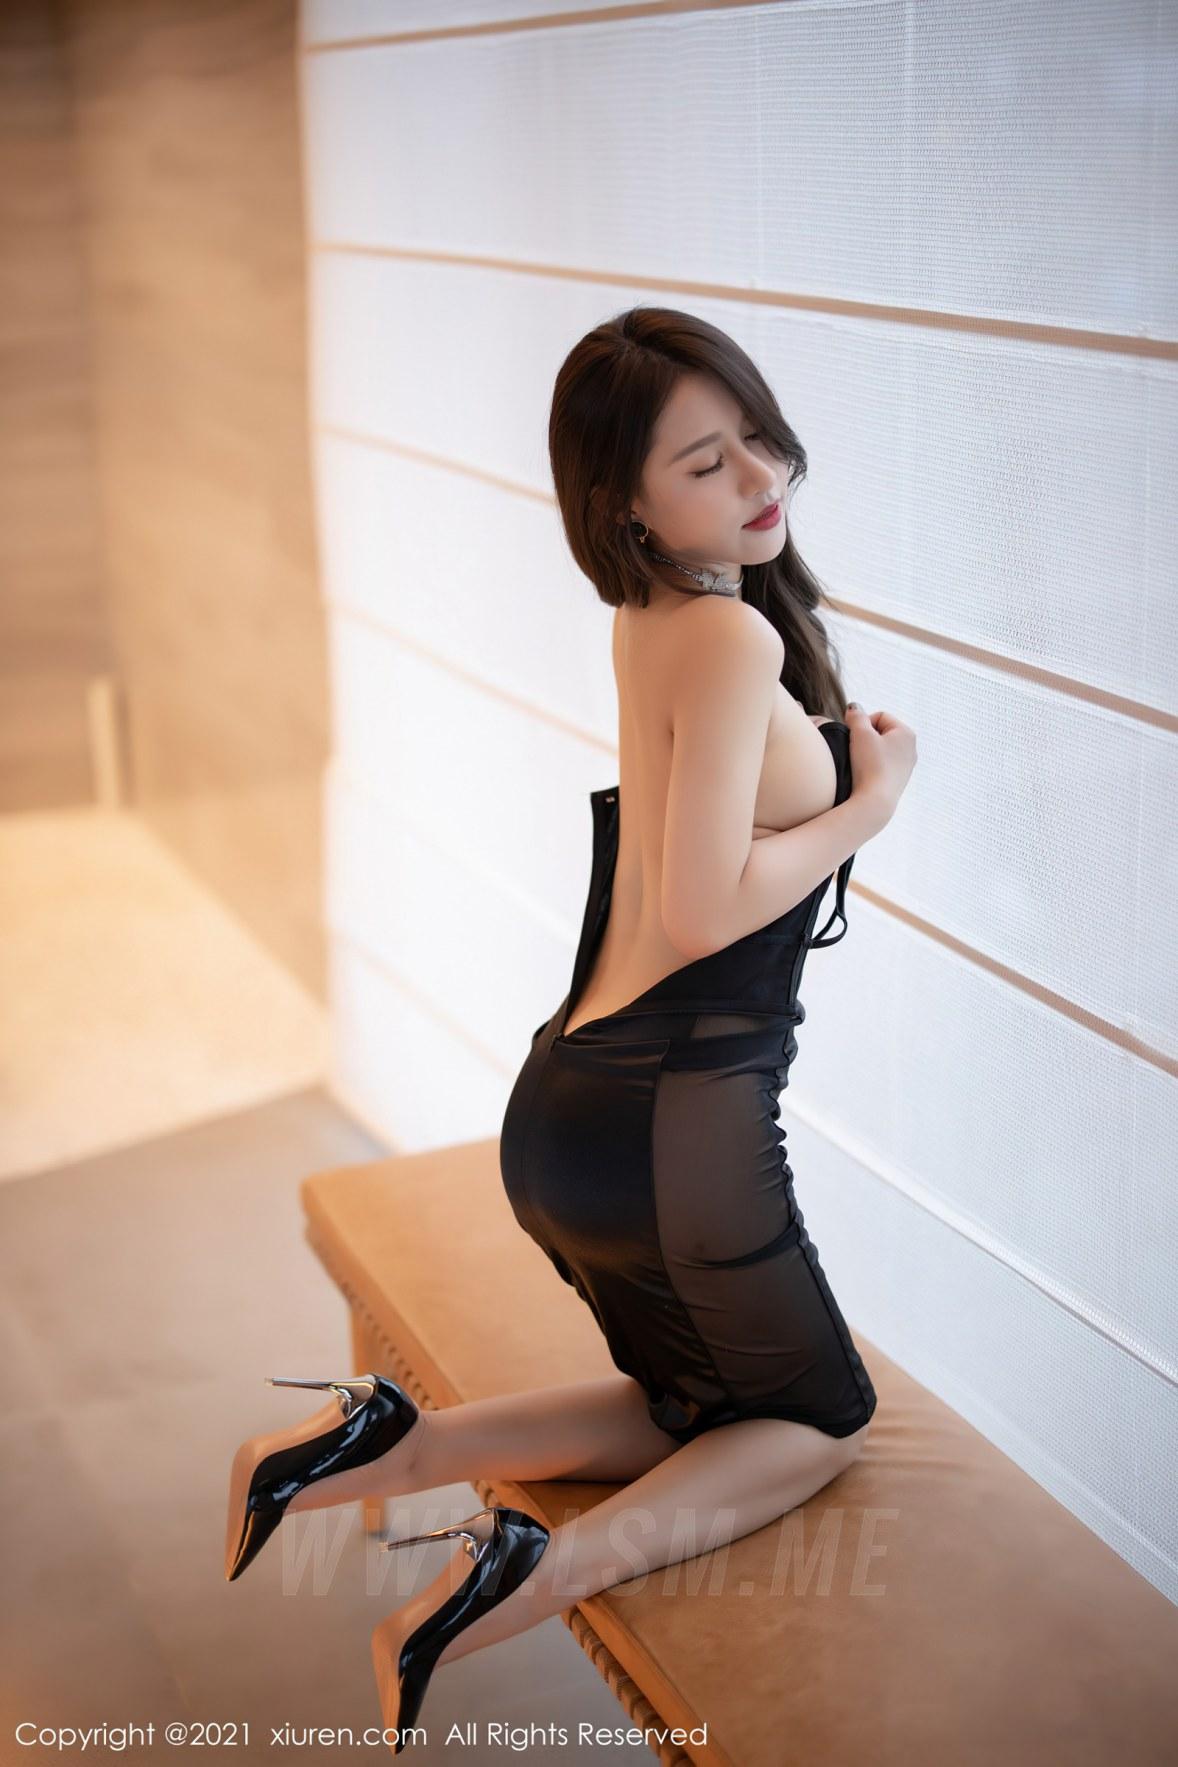 3465 024 9w7 3600 5400 - XiuRen 秀人 No.3465  黑色吊裙 徐安安 三亚旅拍写真 - 秀人网 -【免费在线写真】【丽人丝语】